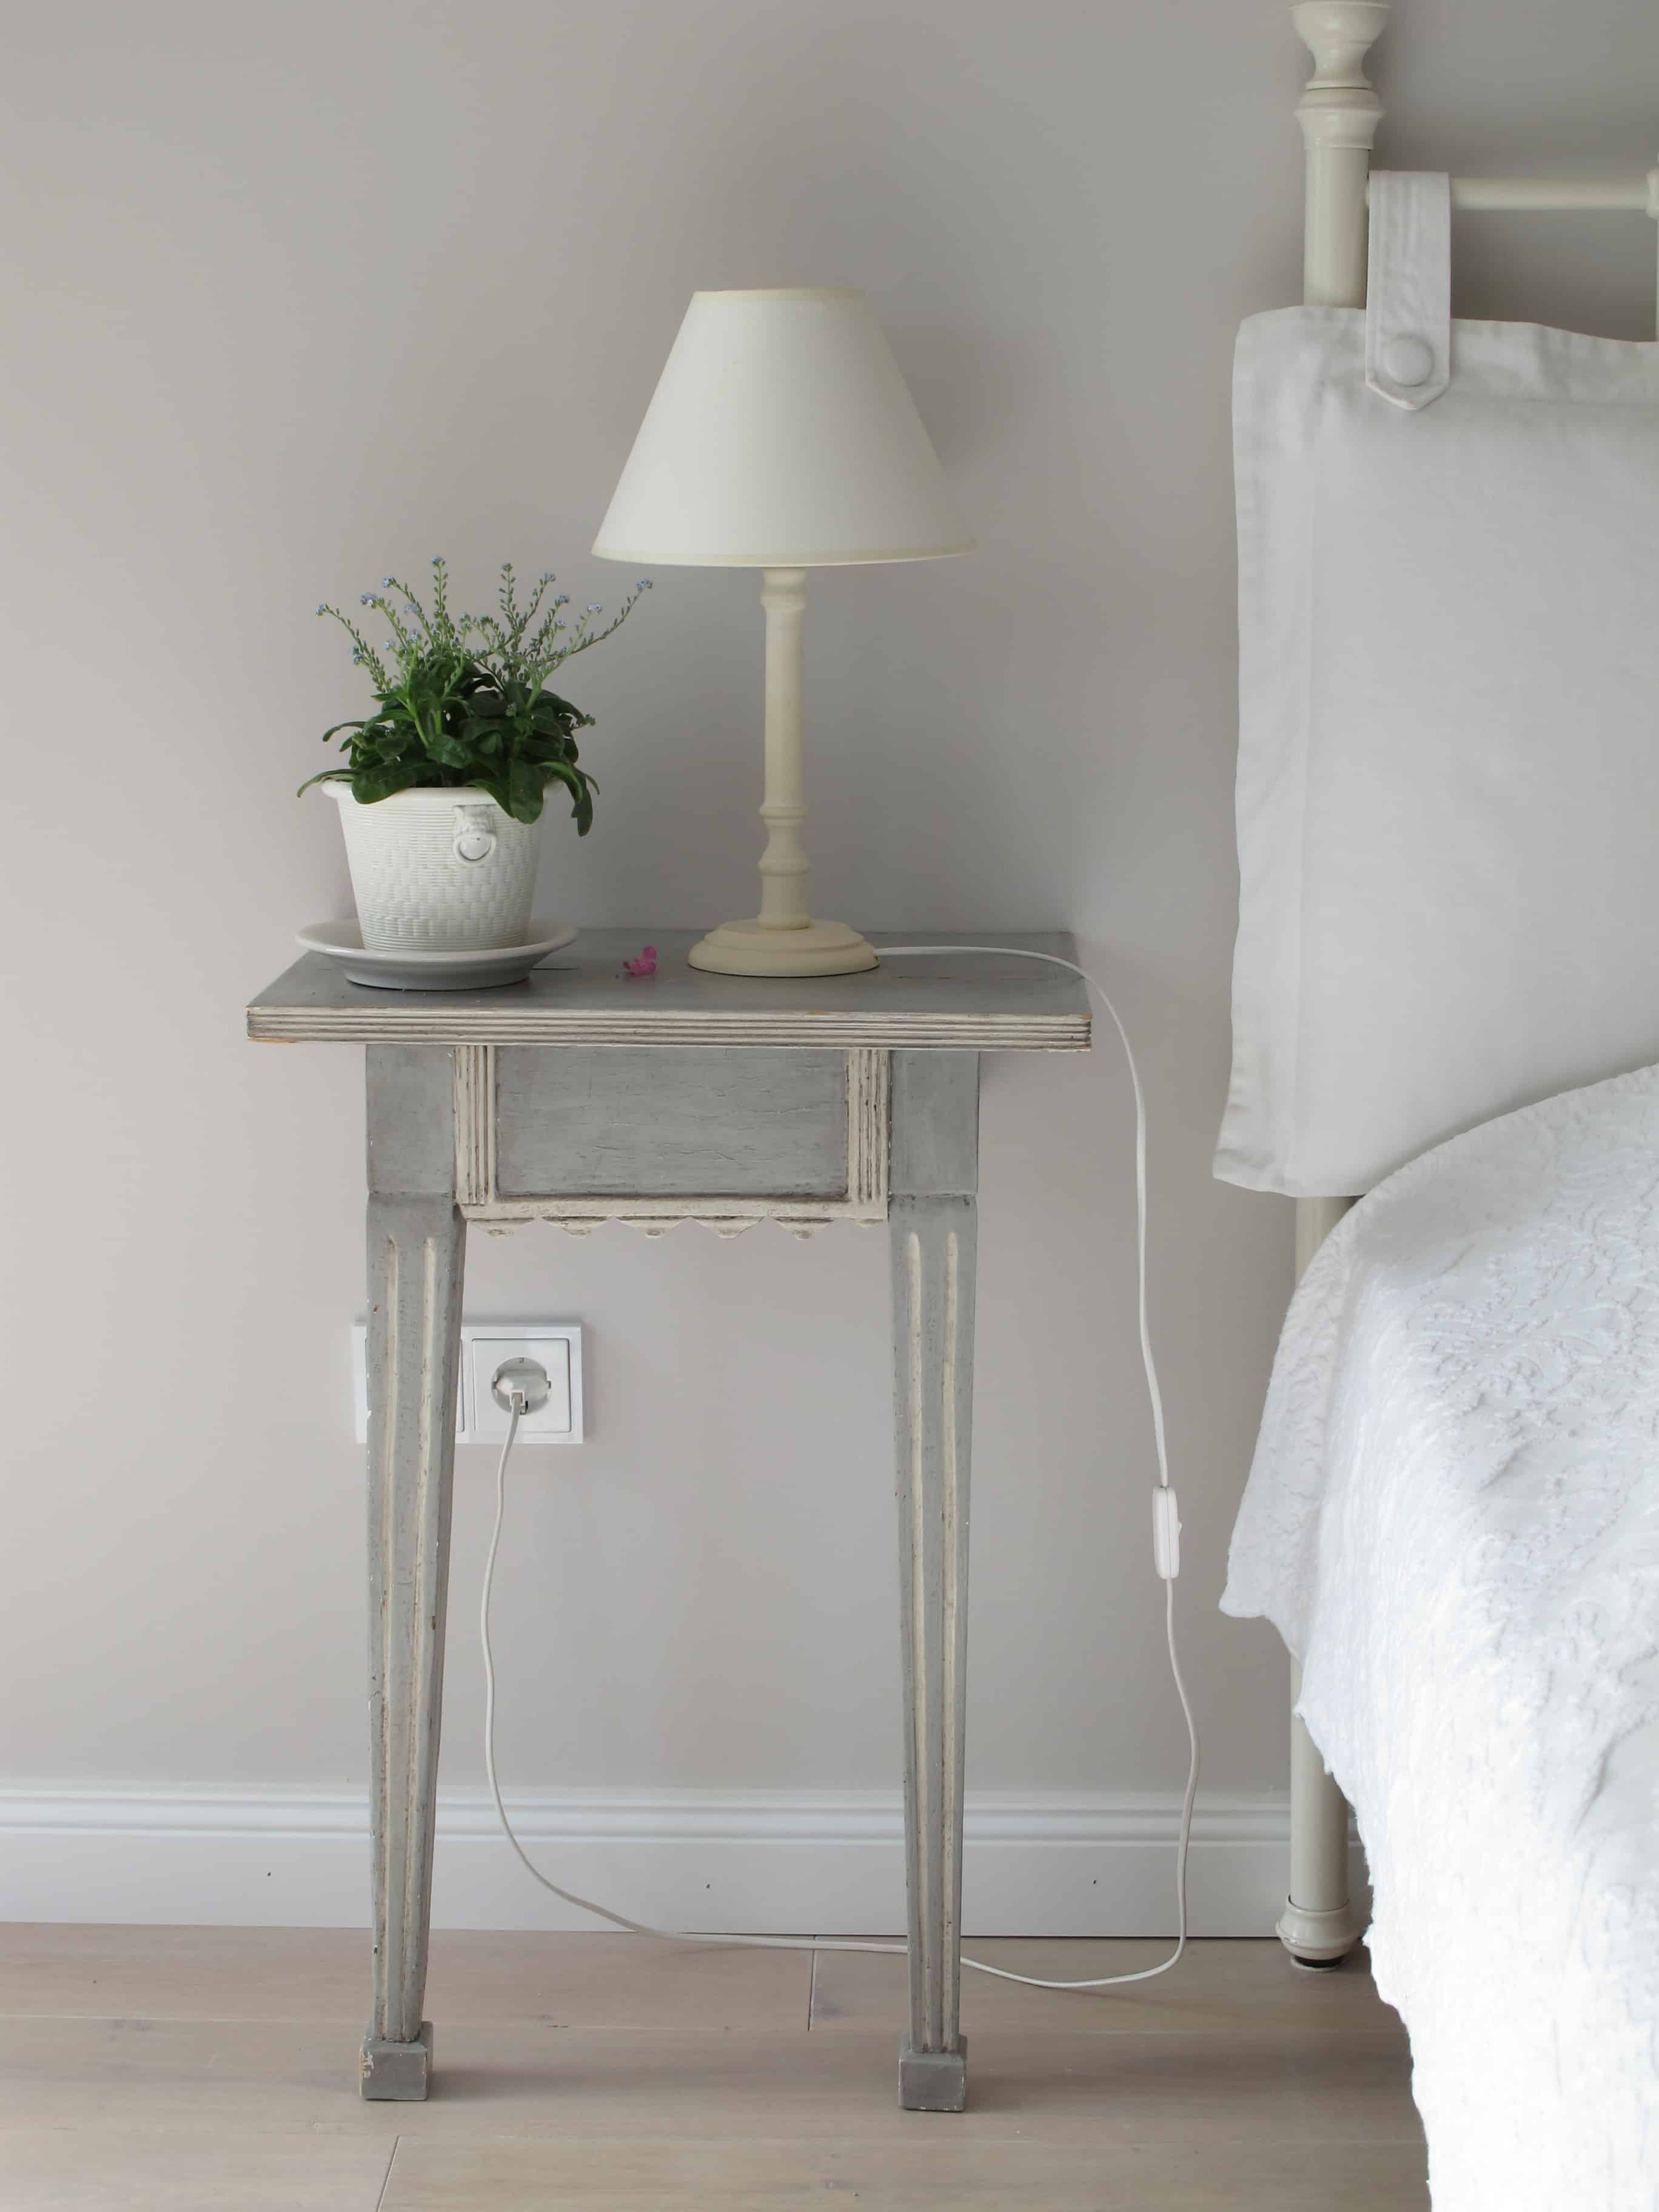 Lagom - Swedish philosophy of a balanced home